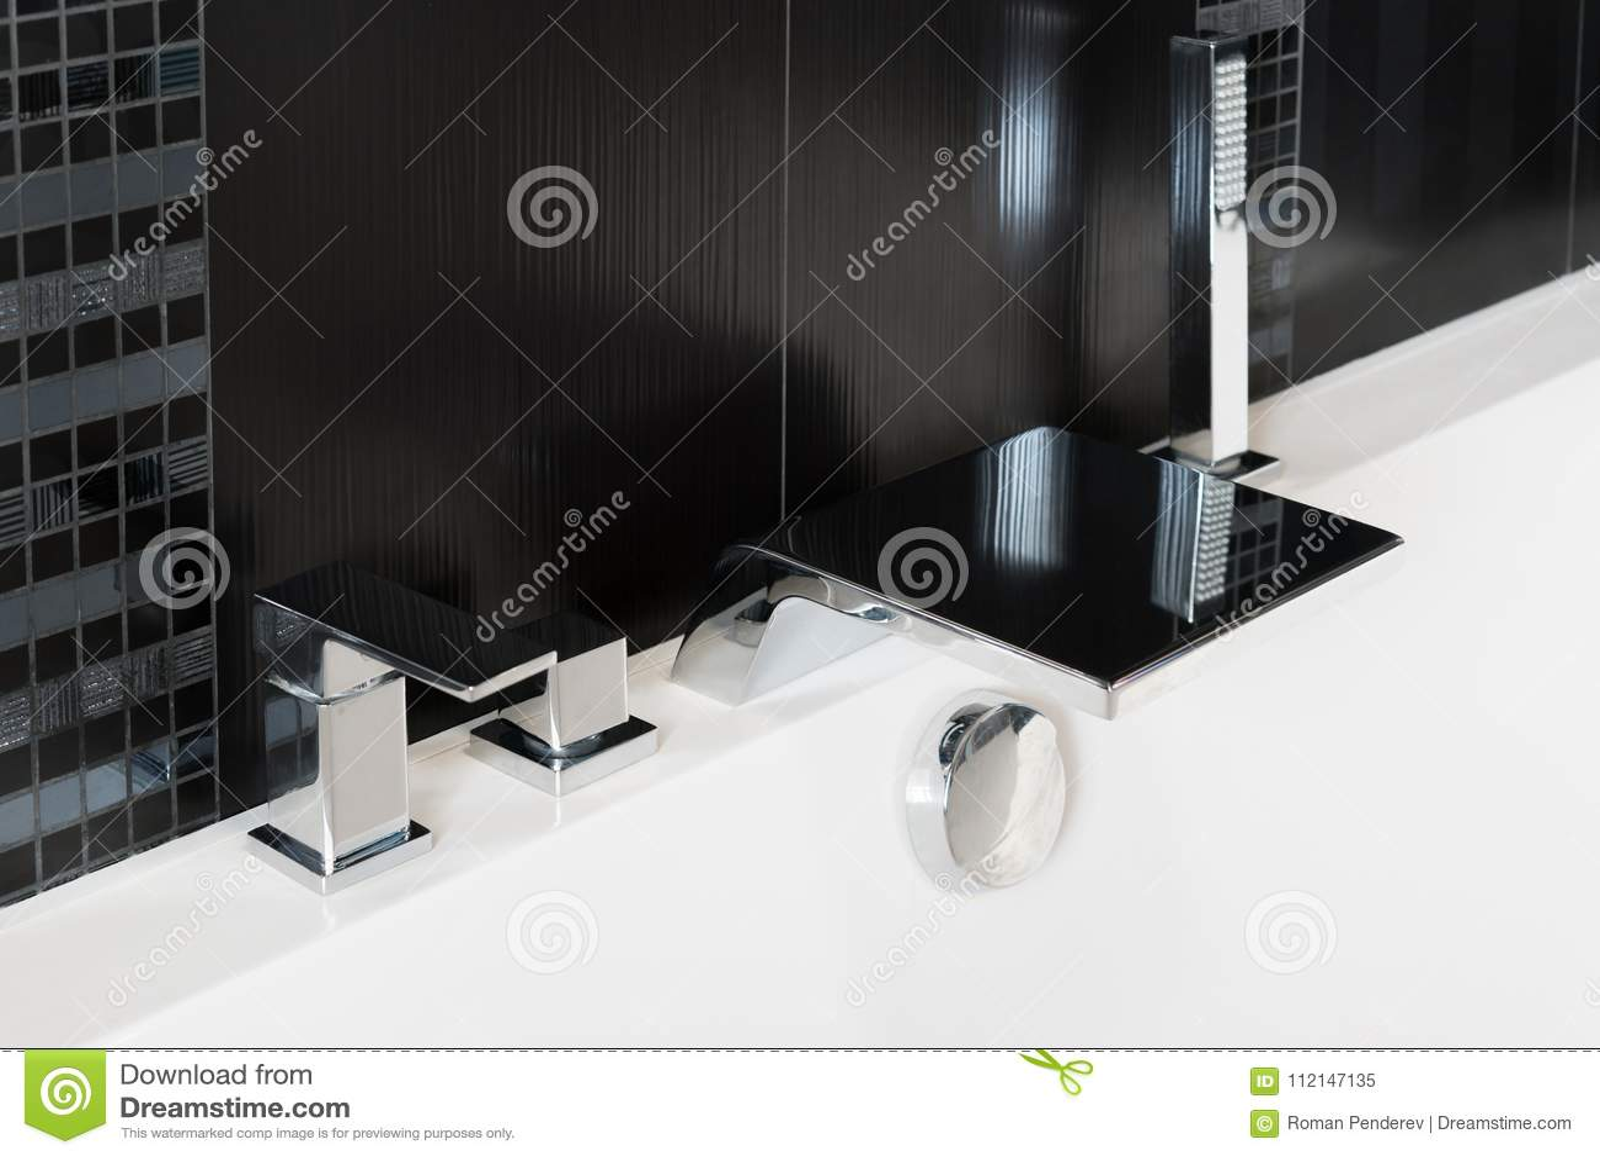 Basin Mixer Tap, Bath Shower Mixer, Waterfall Faucet And Shower Head ...